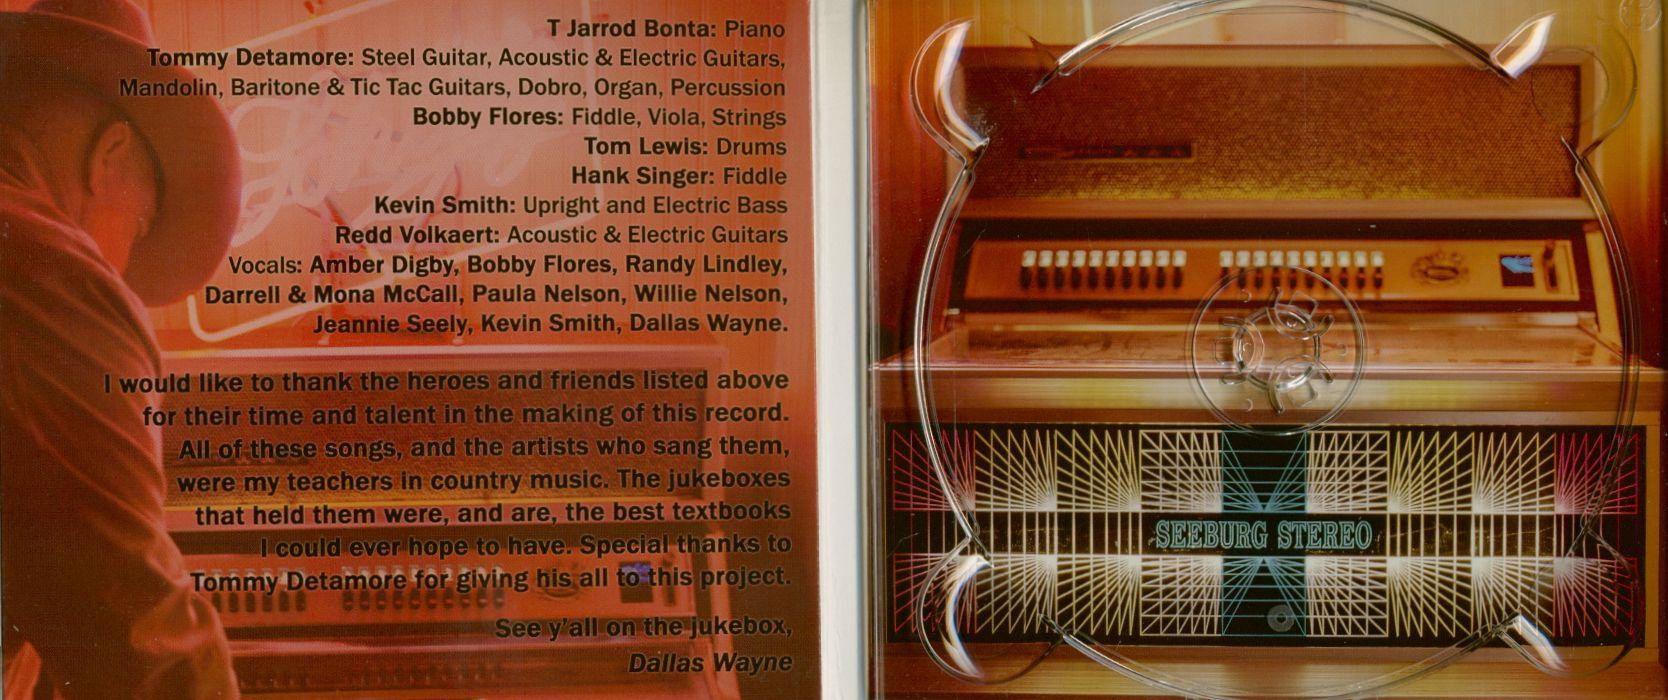 Dallas Wayne Songs The Jukebox Thought Me (CD)